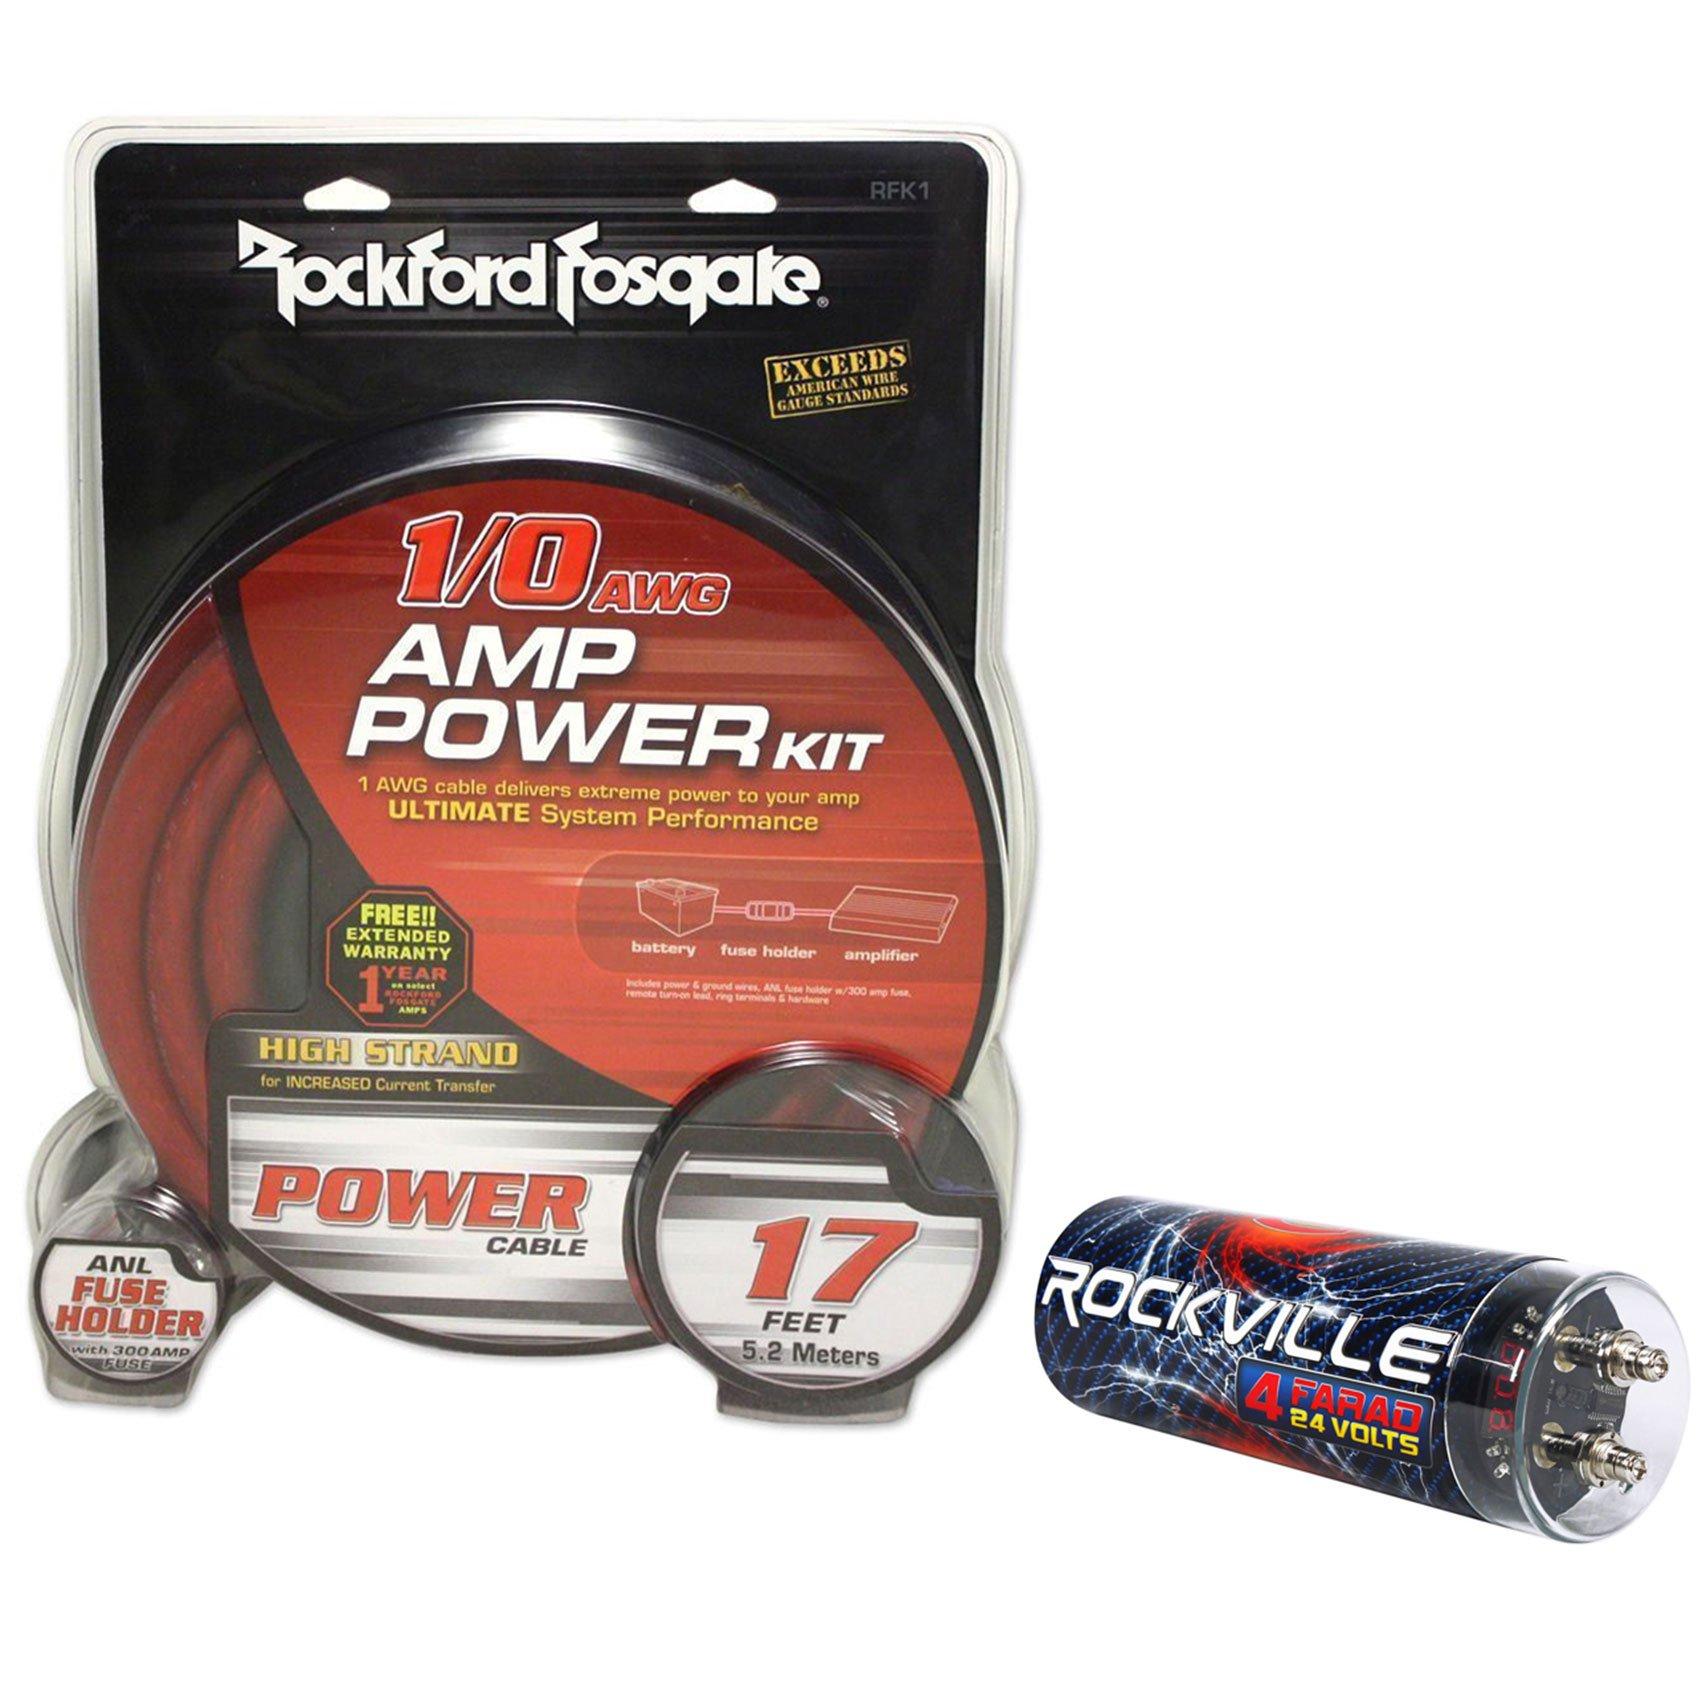 Rockford Fosgate RFK1 1/0 Gauge 100% OFC Copper Amplifier Kit+4 Farad Capacitor